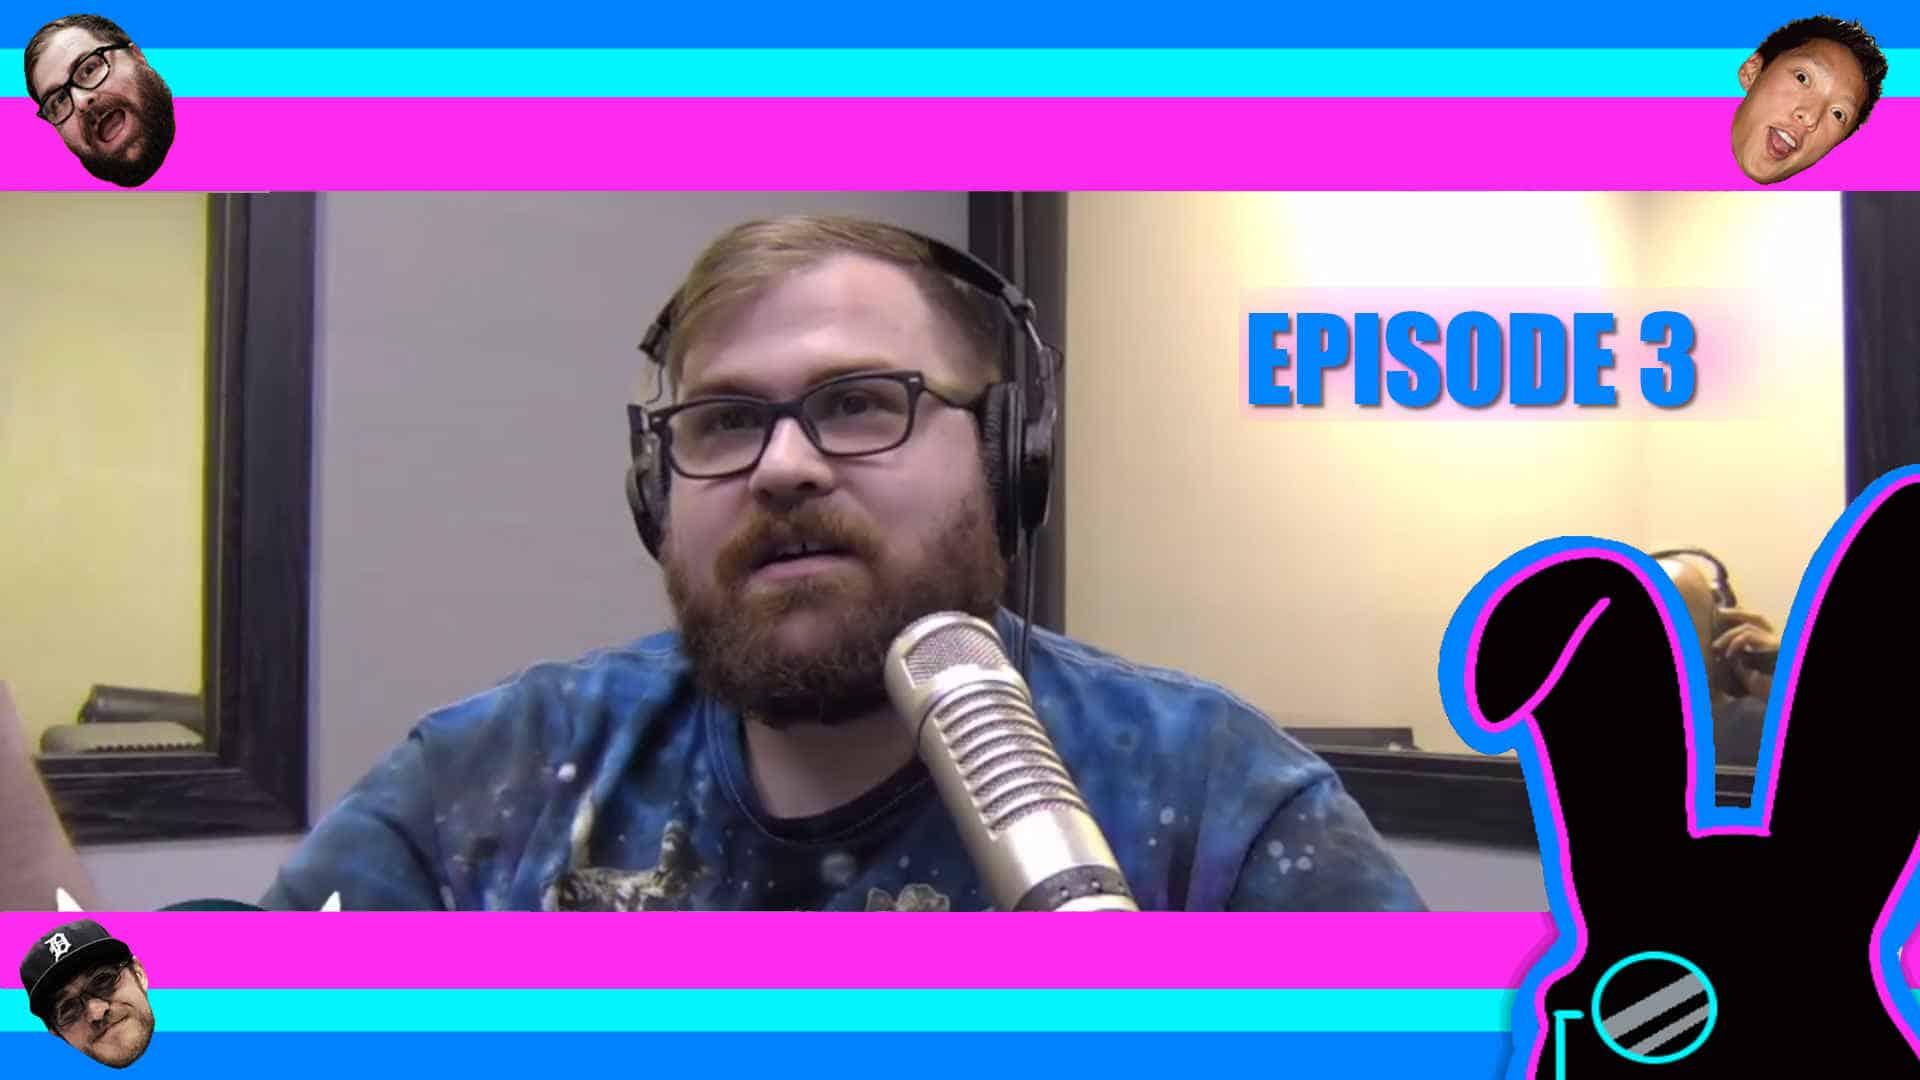 Geektainment Weekly - Episode 3